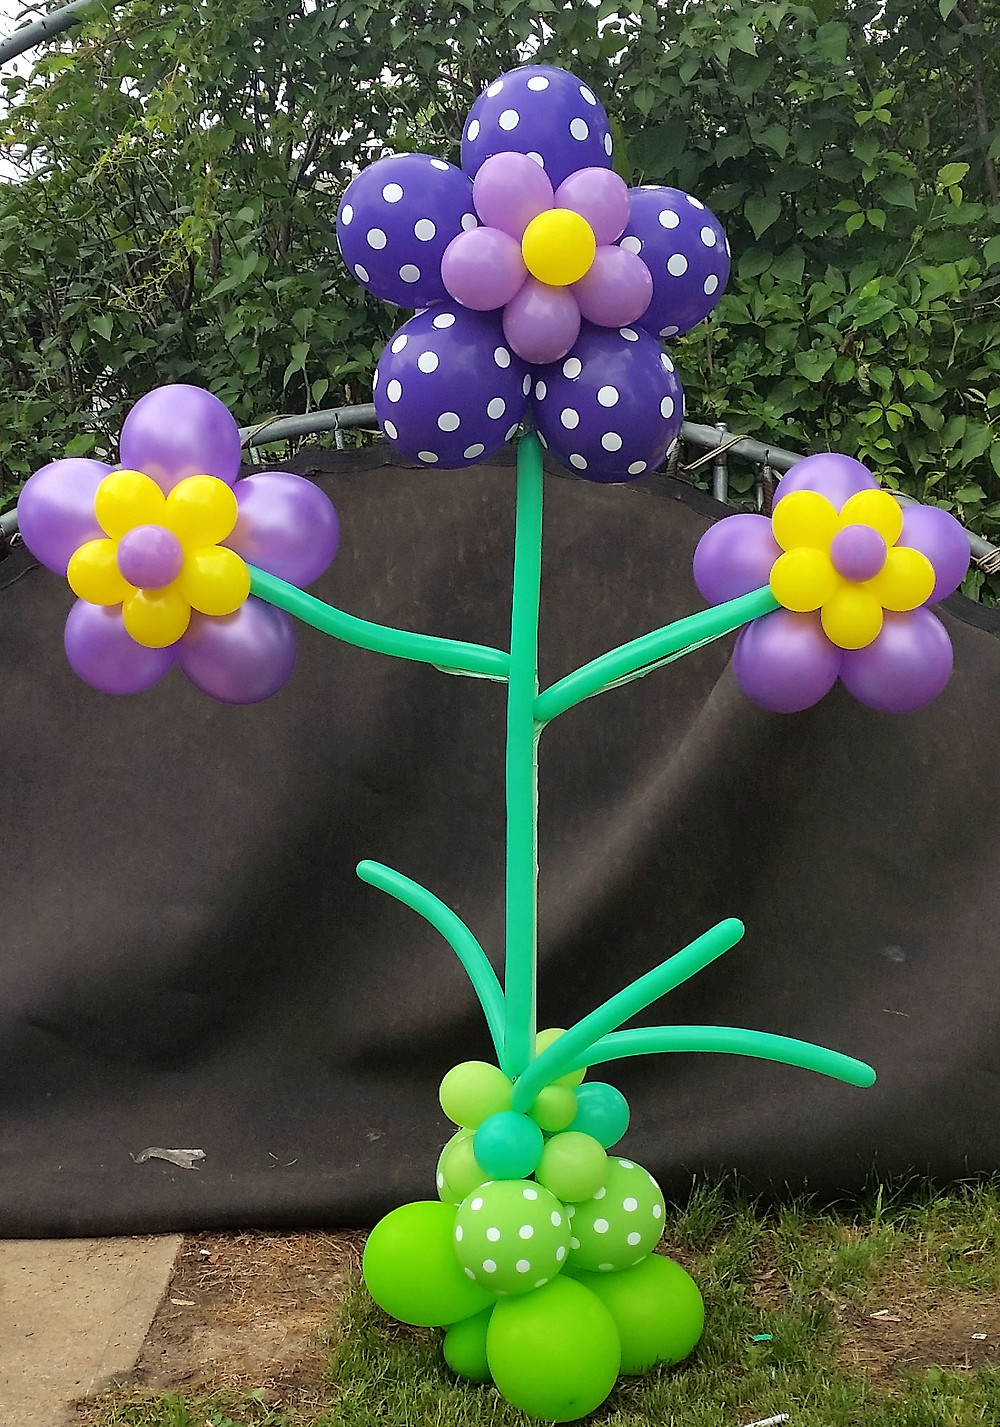 Harmony Party rental - Balloon decorations